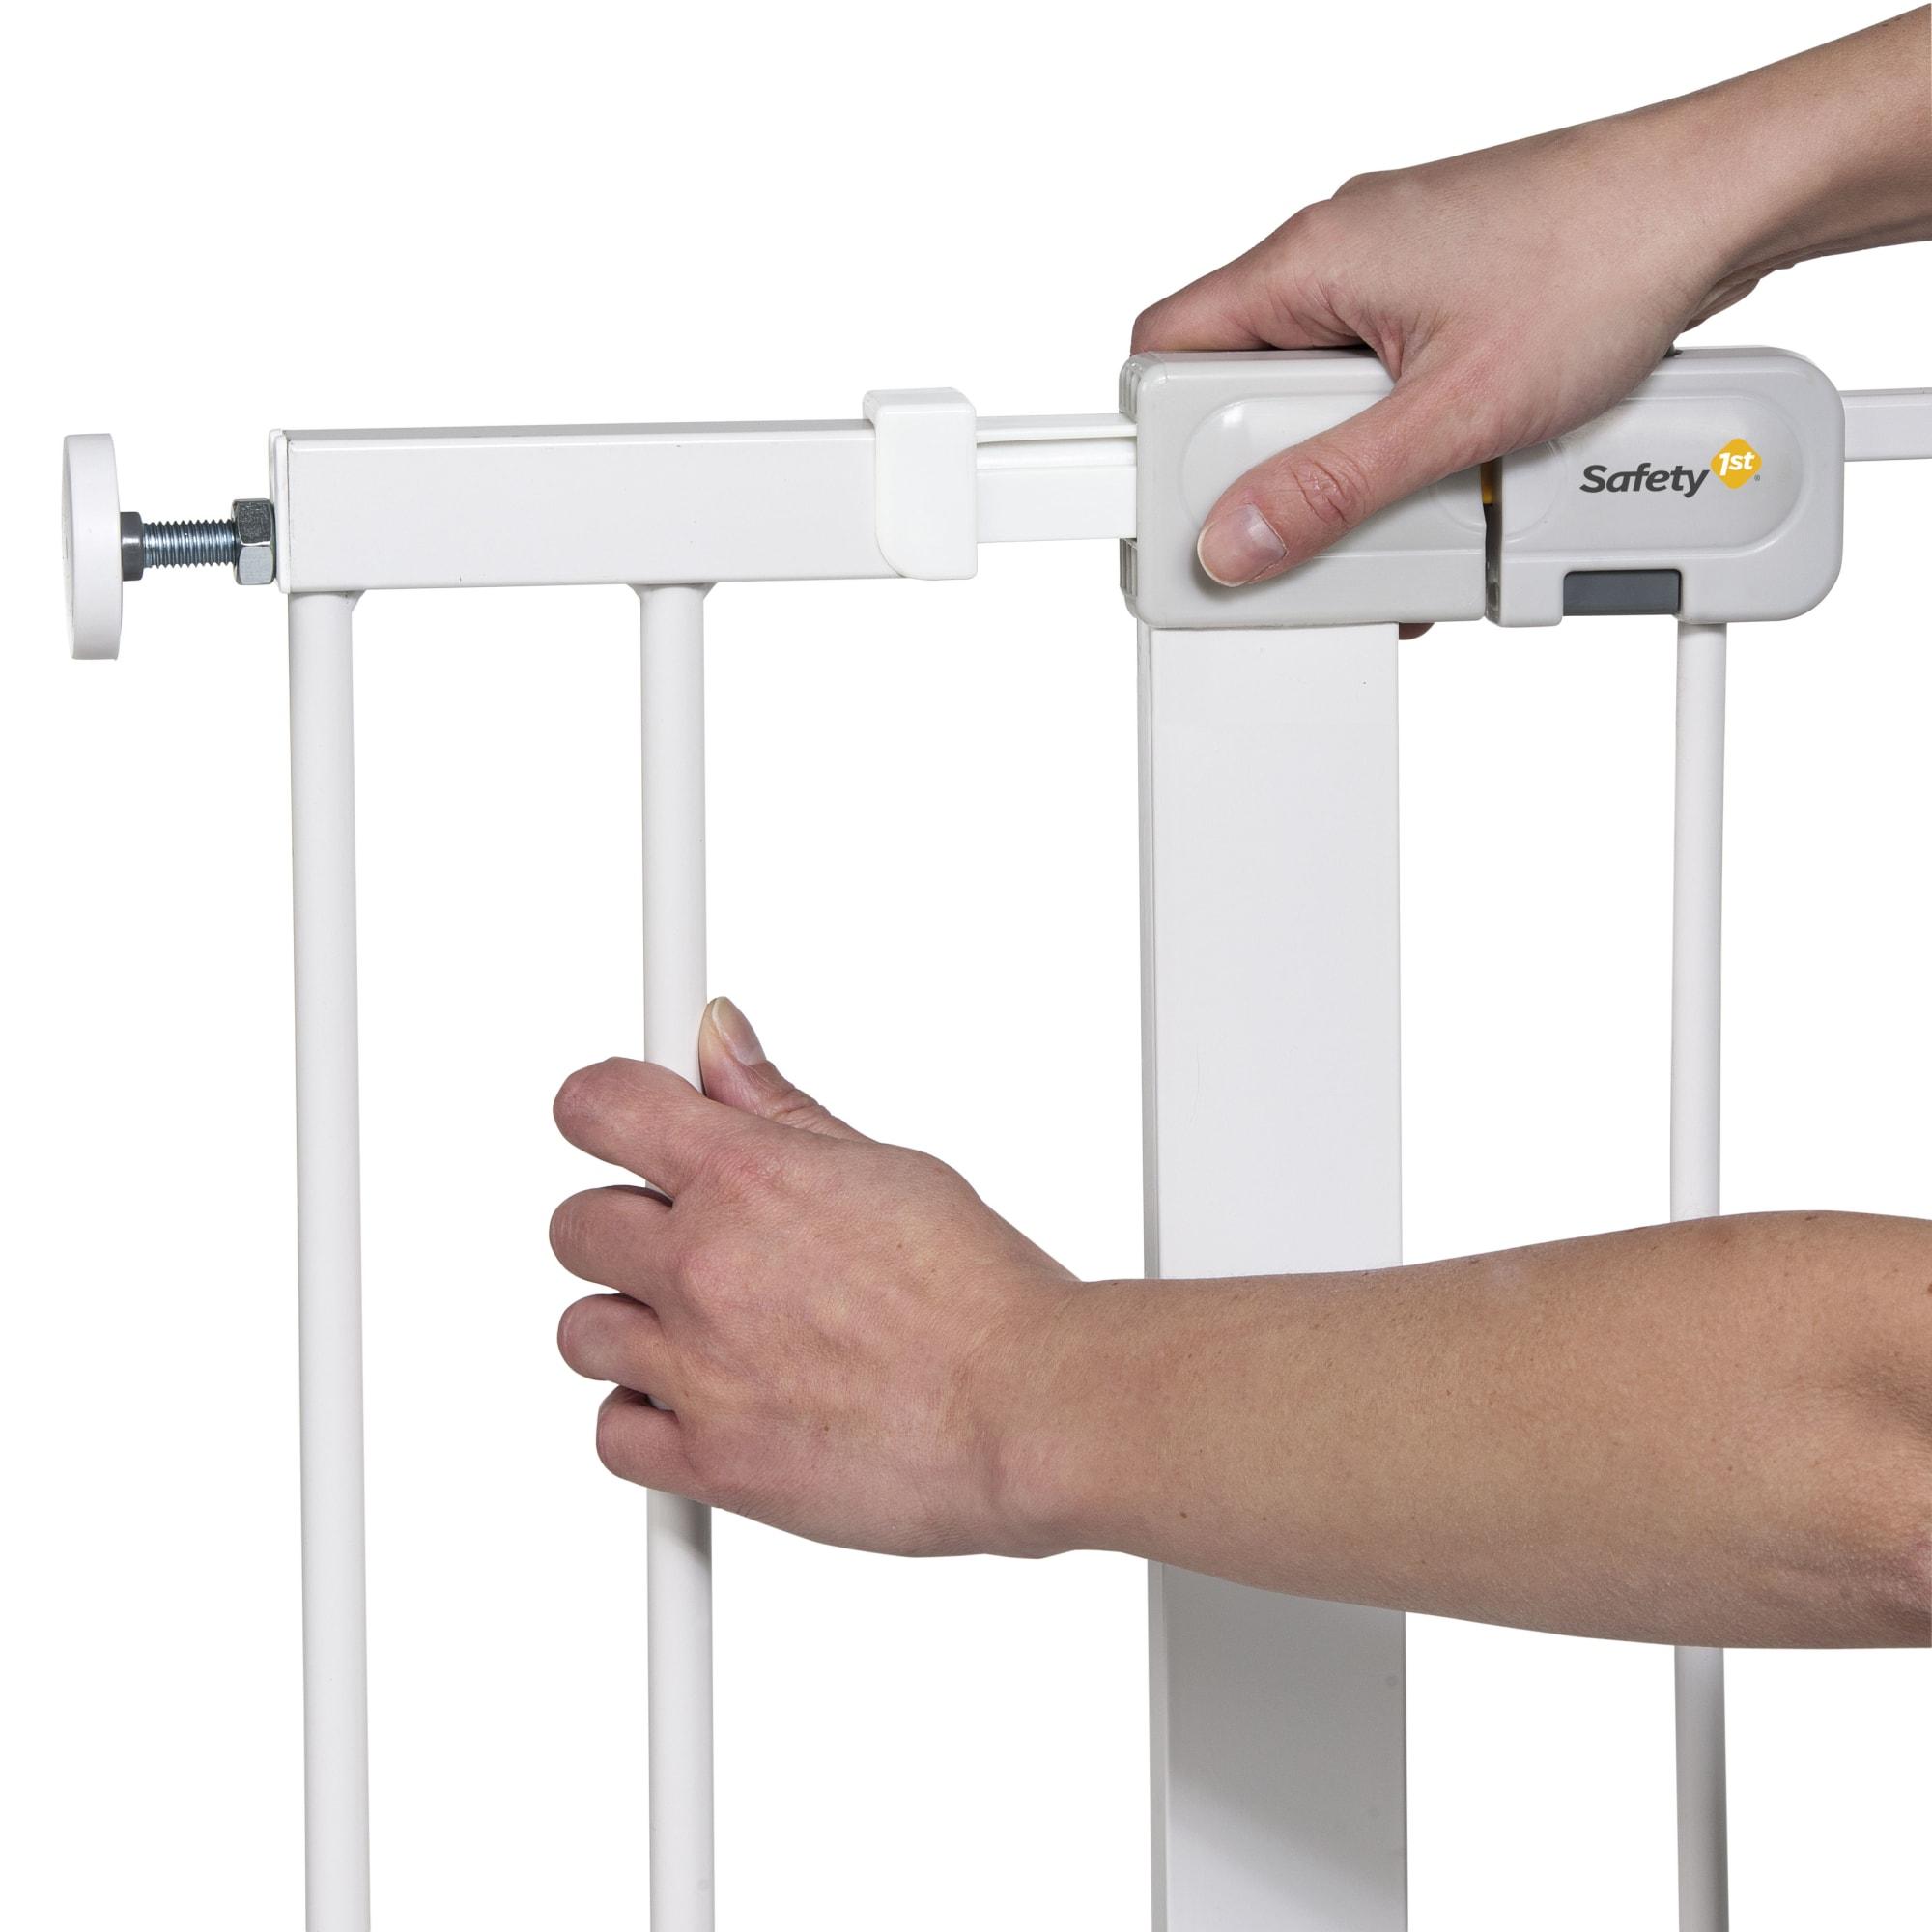 14 cm - Monteres nemt på dit Safety1st gitter